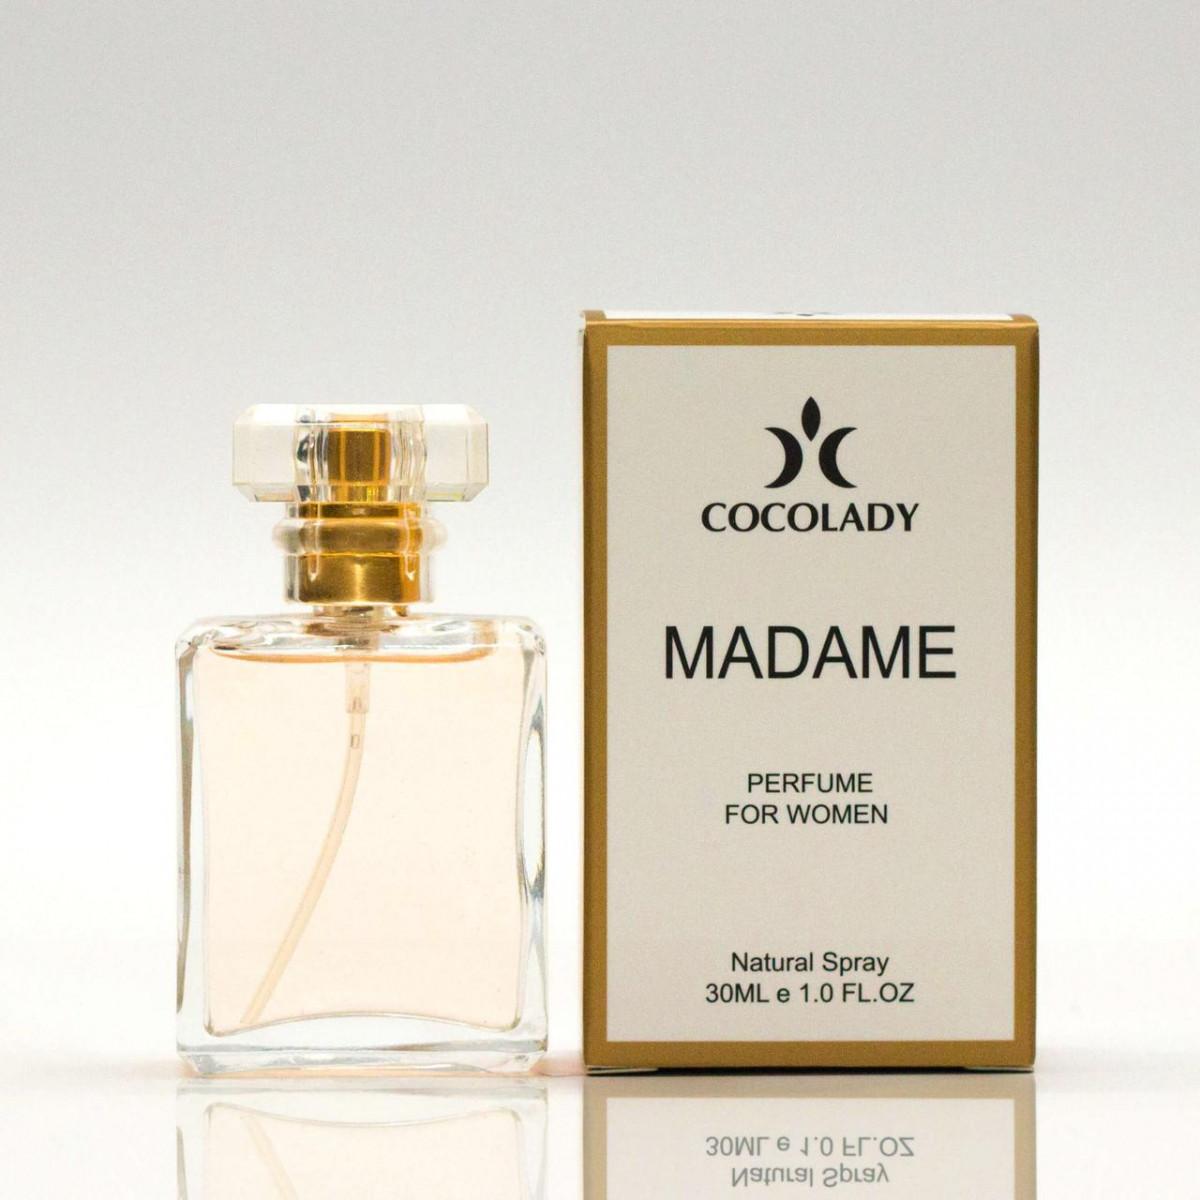 Cocolady Madame 30 ml TOPfor